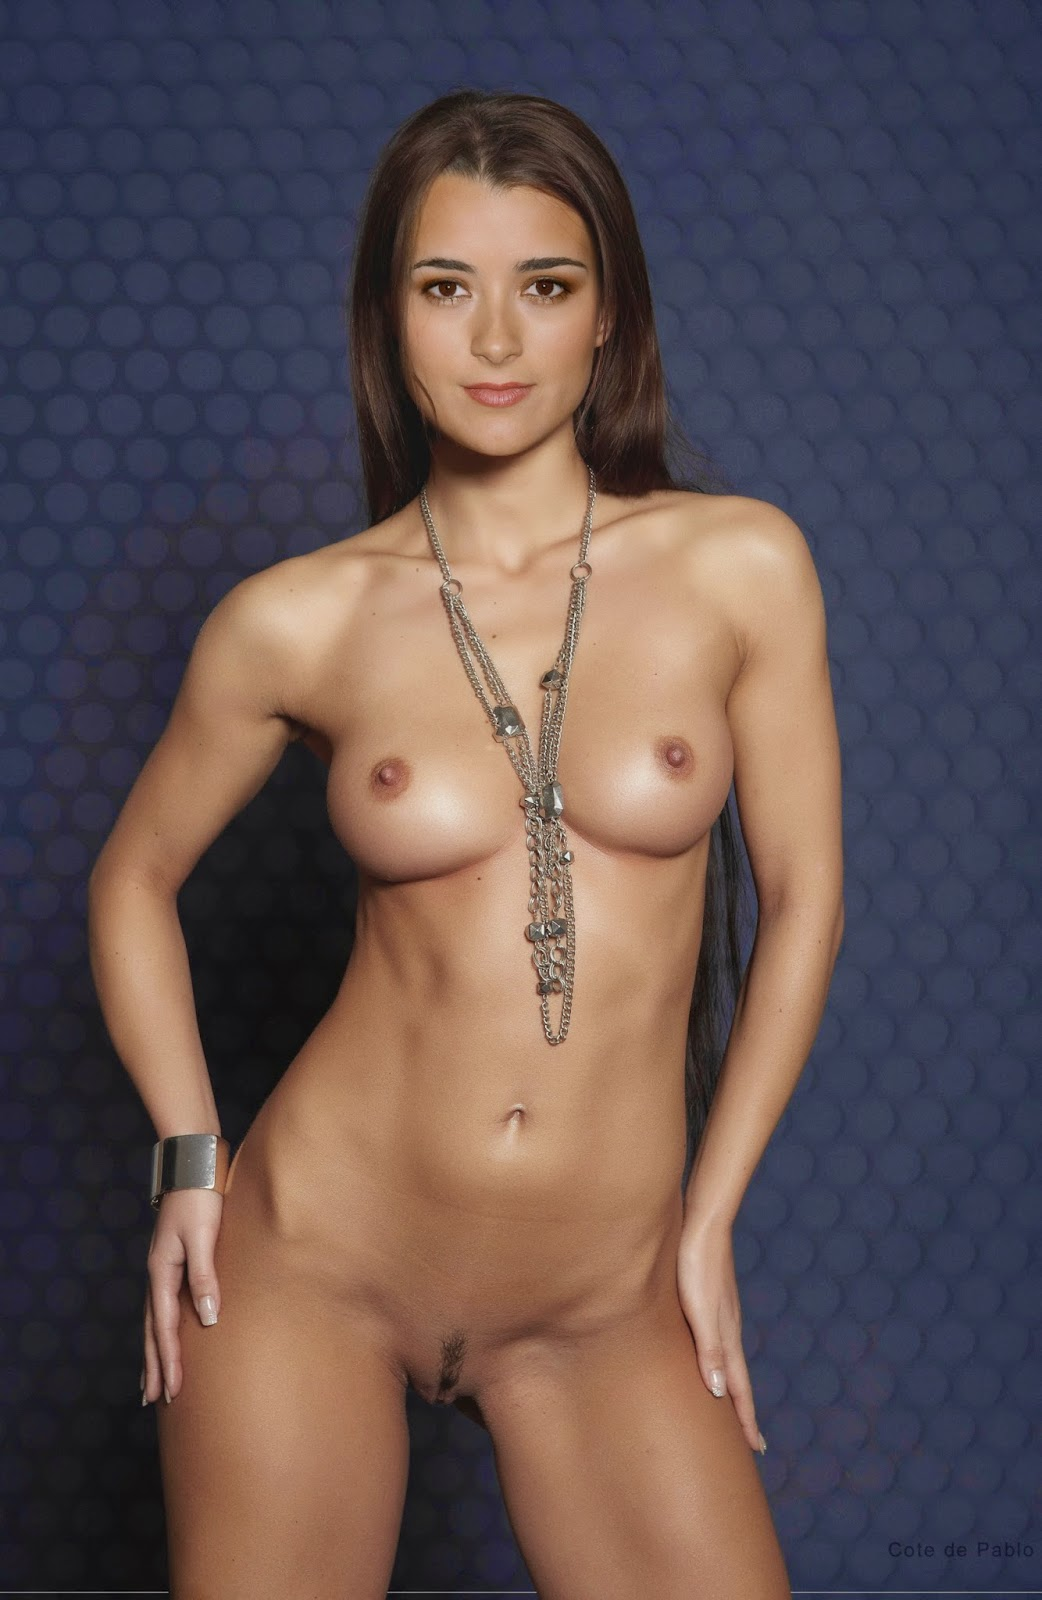 Nackt Bilder : Cote de Pablo Sexi Actress Fakes Photos   nackter arsch.com